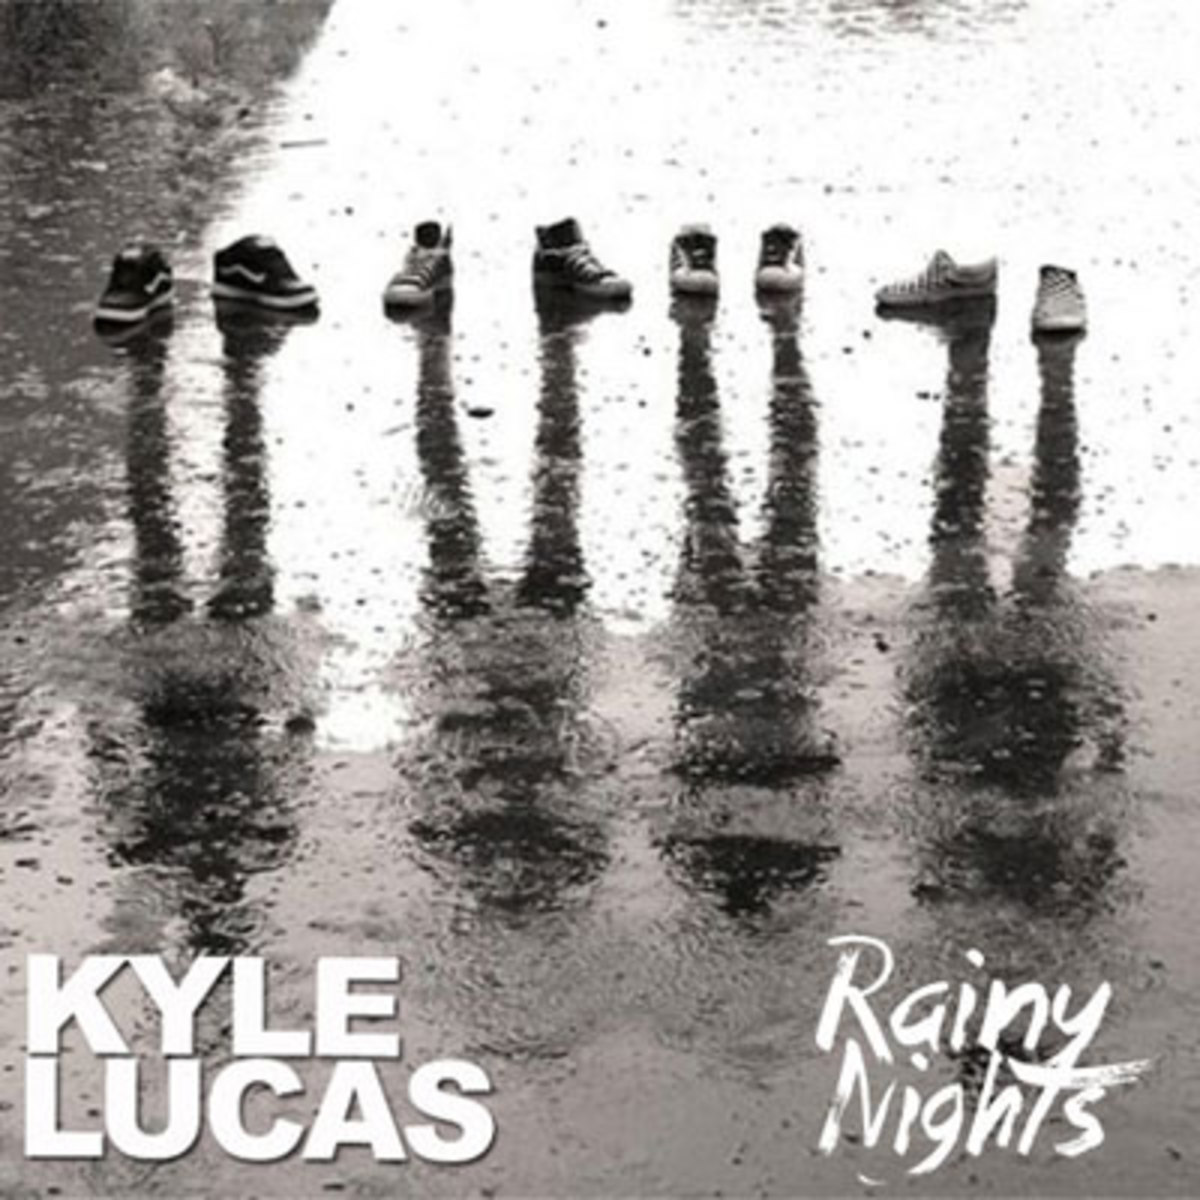 kylelucas-rainynights.jpg